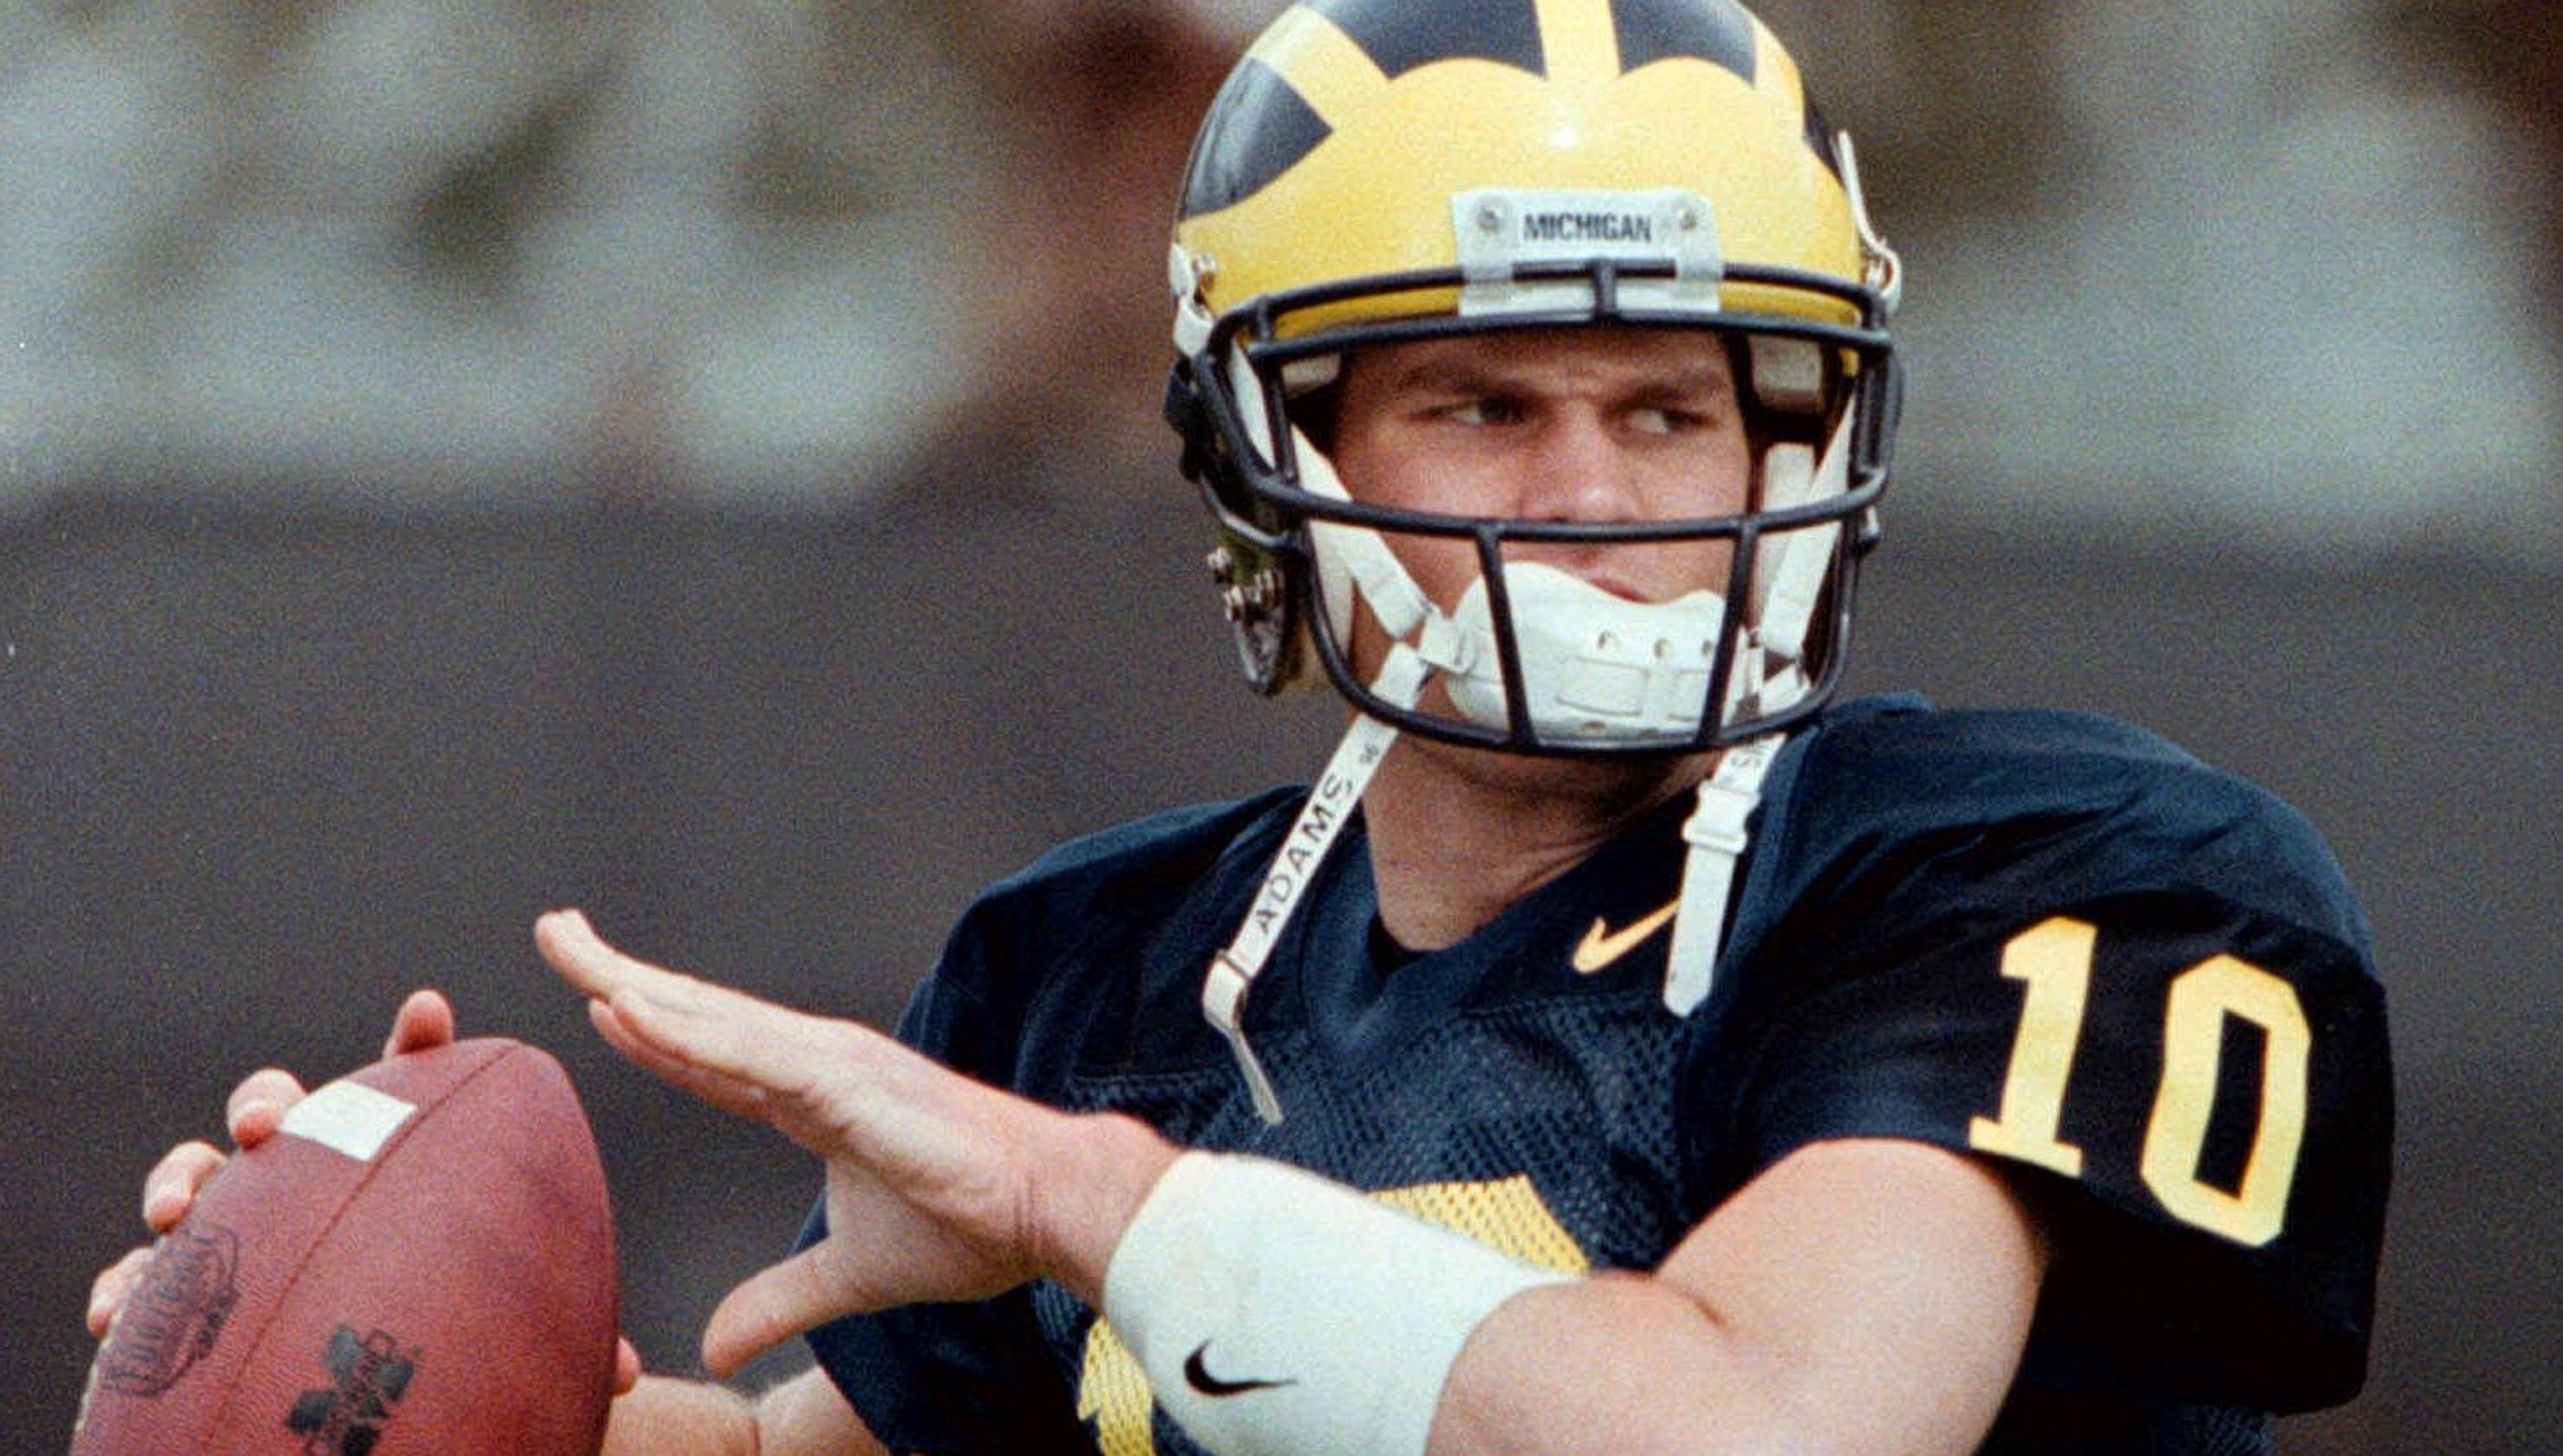 big sale 42962 ea706 As Michigan Wolverine or New England Patriot, Tom Brady 'a ...